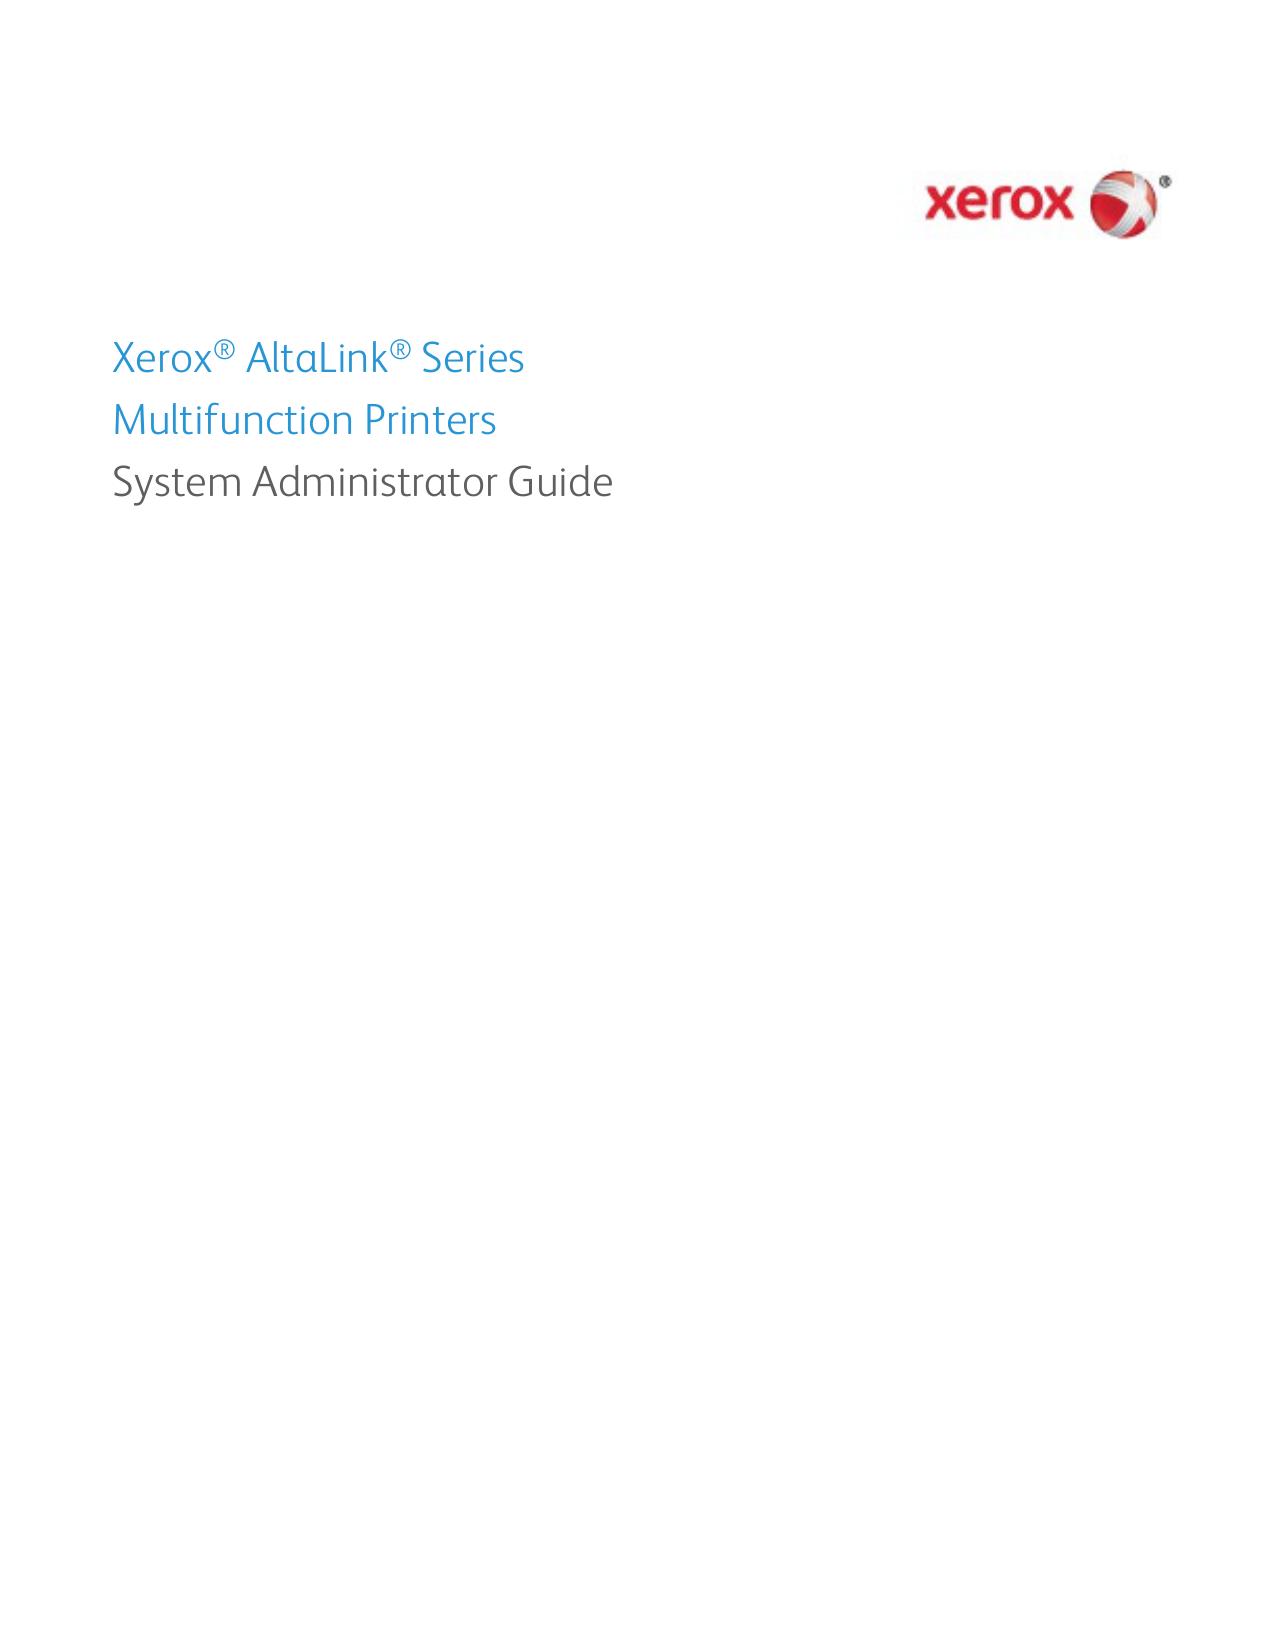 Xerox® AltaLink® Series Multifunction Printers System